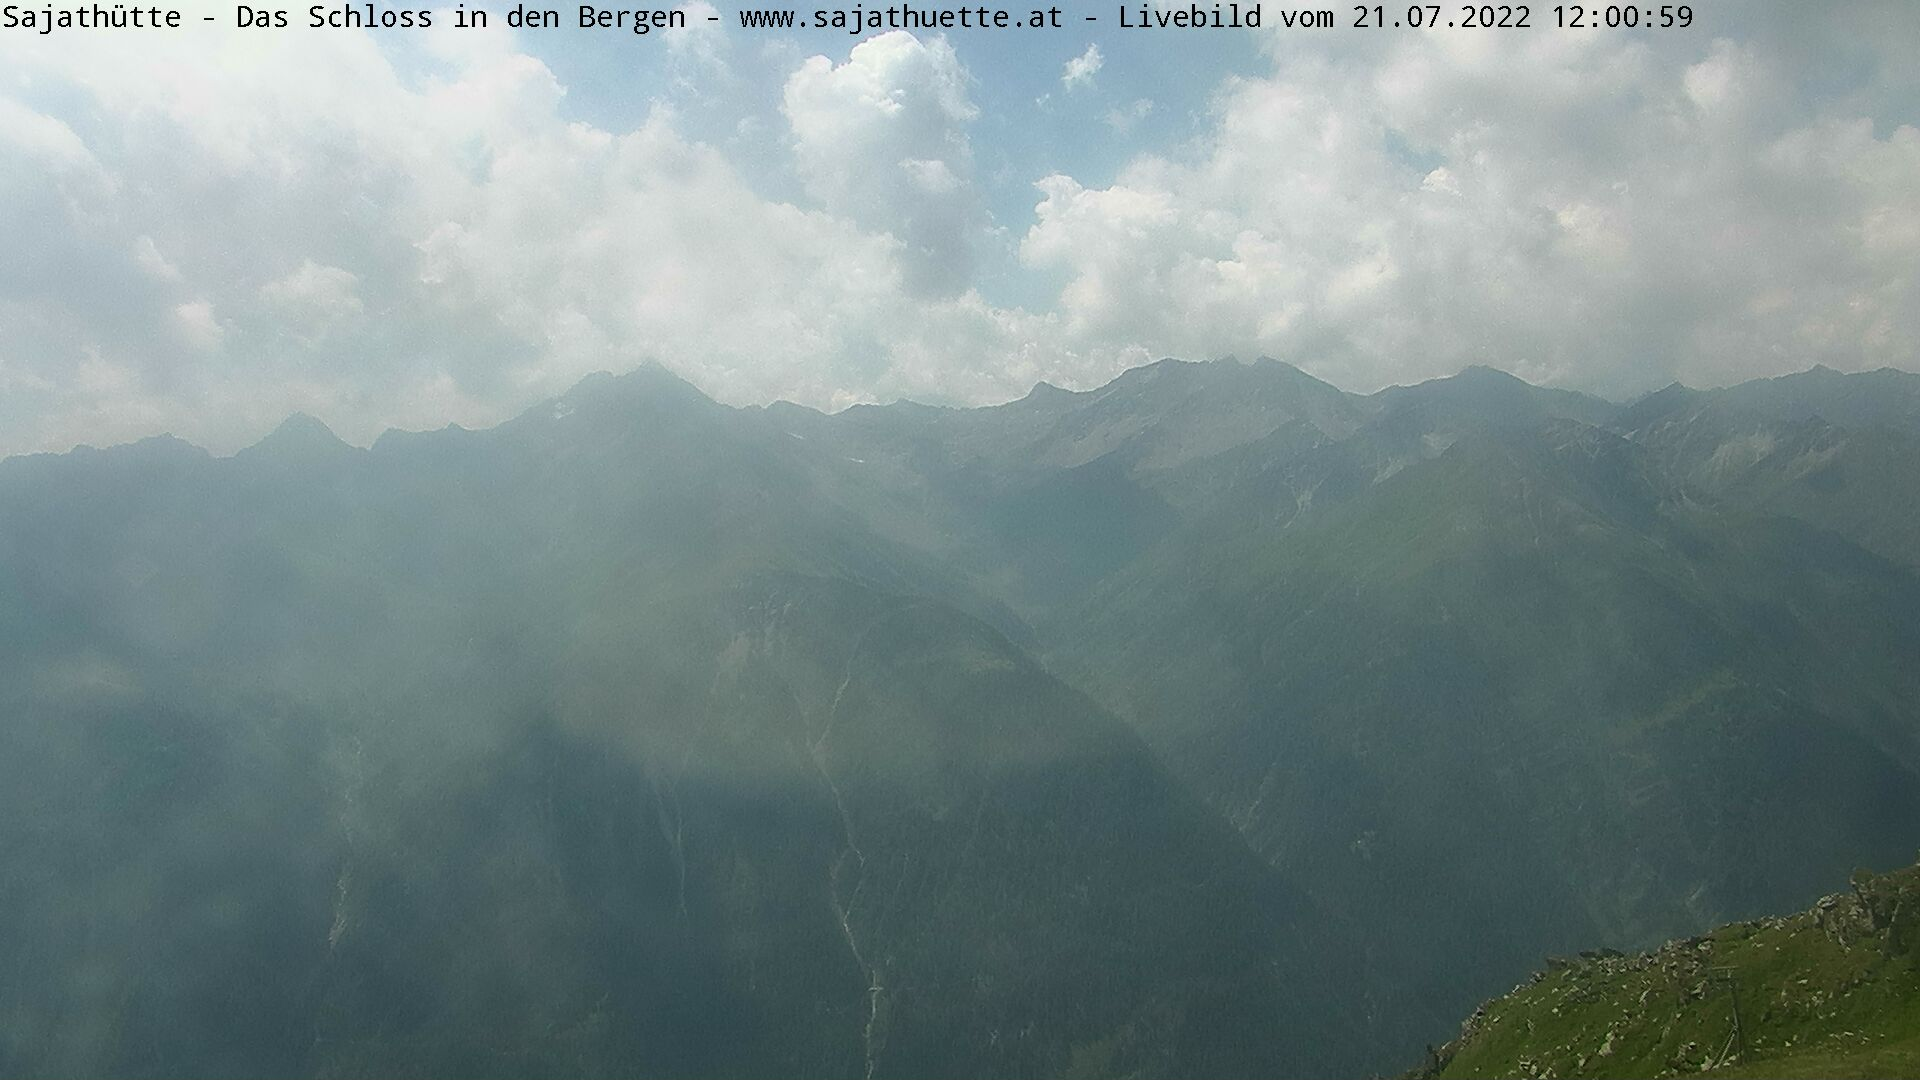 Webcam Blick Richtung Lasörlinggruppe (Süd)   Webcam Sajat-Hütte 2.600 m